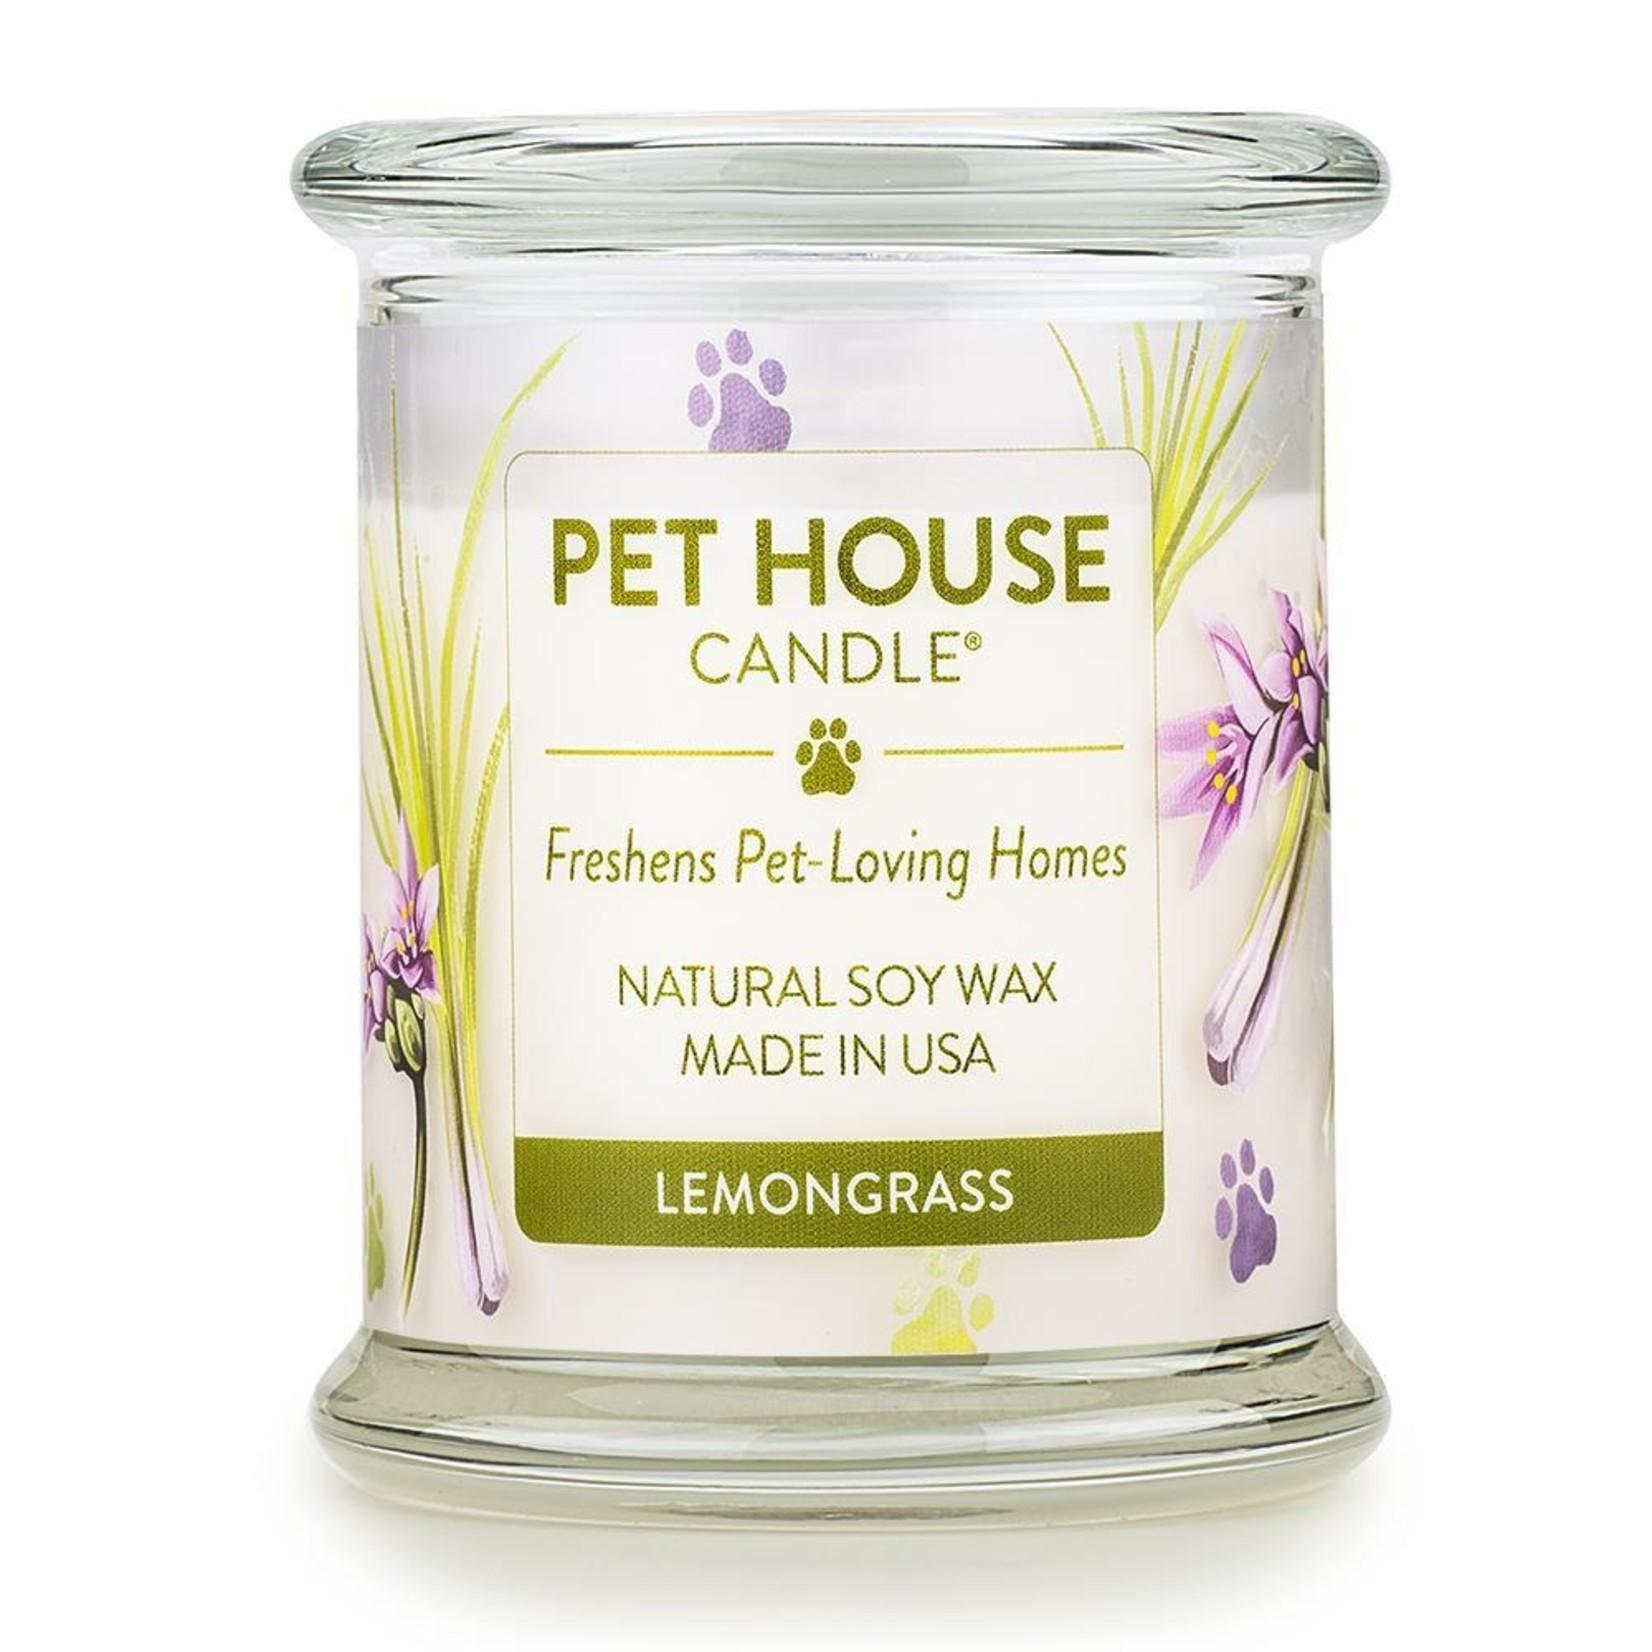 Pet House Pet House Lemongrass Candle 9oz